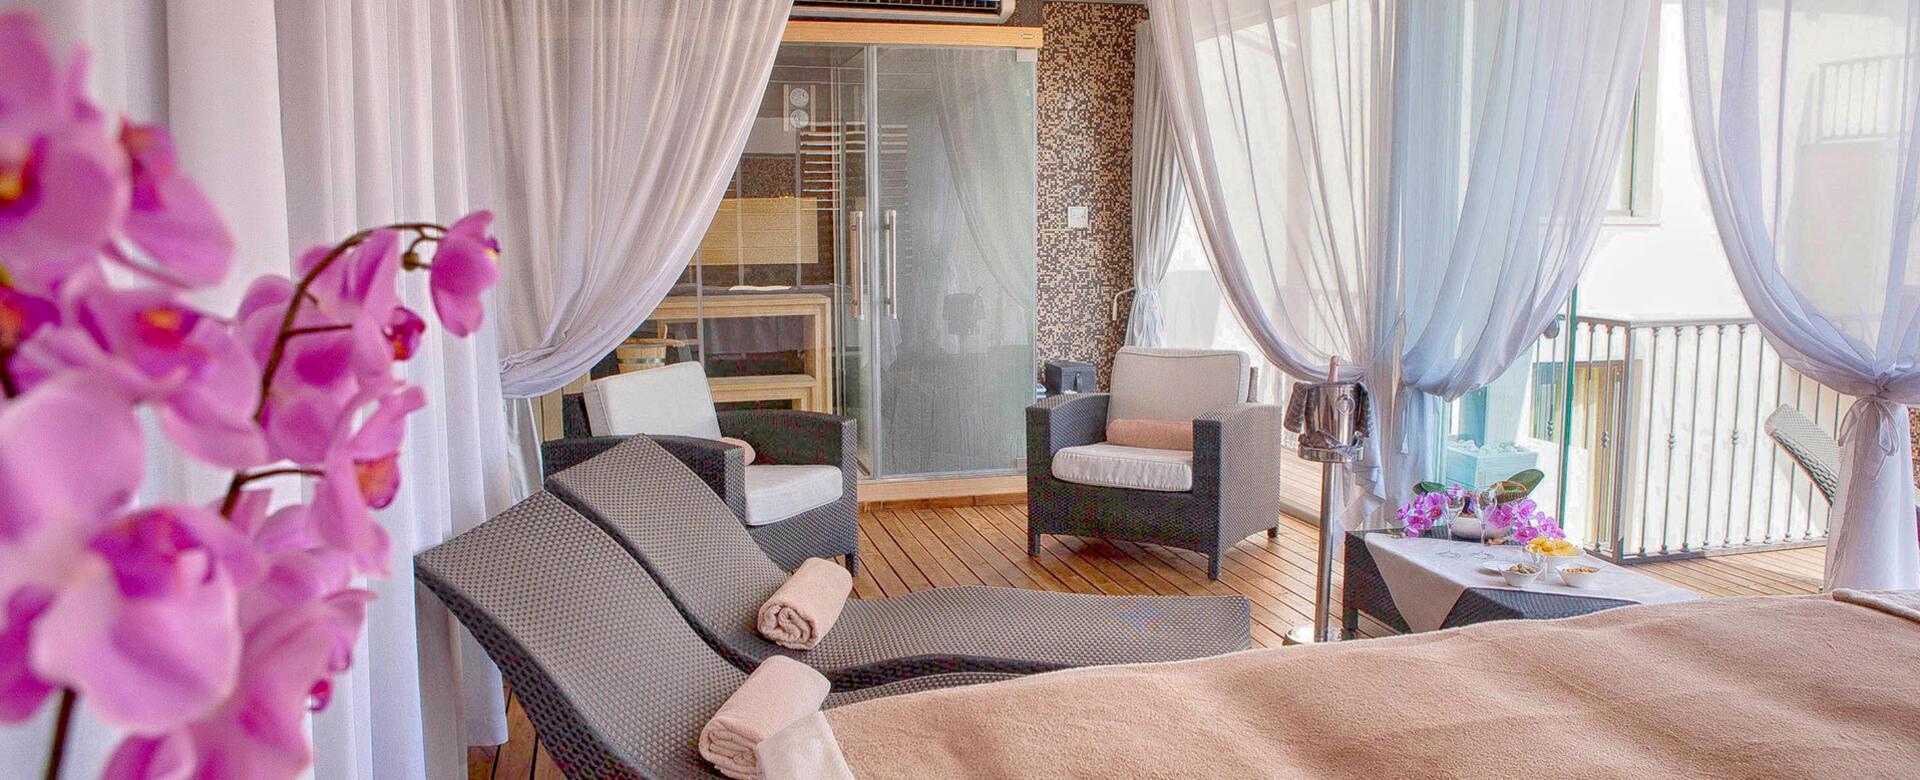 hotelvillaluisa de private-spa 003